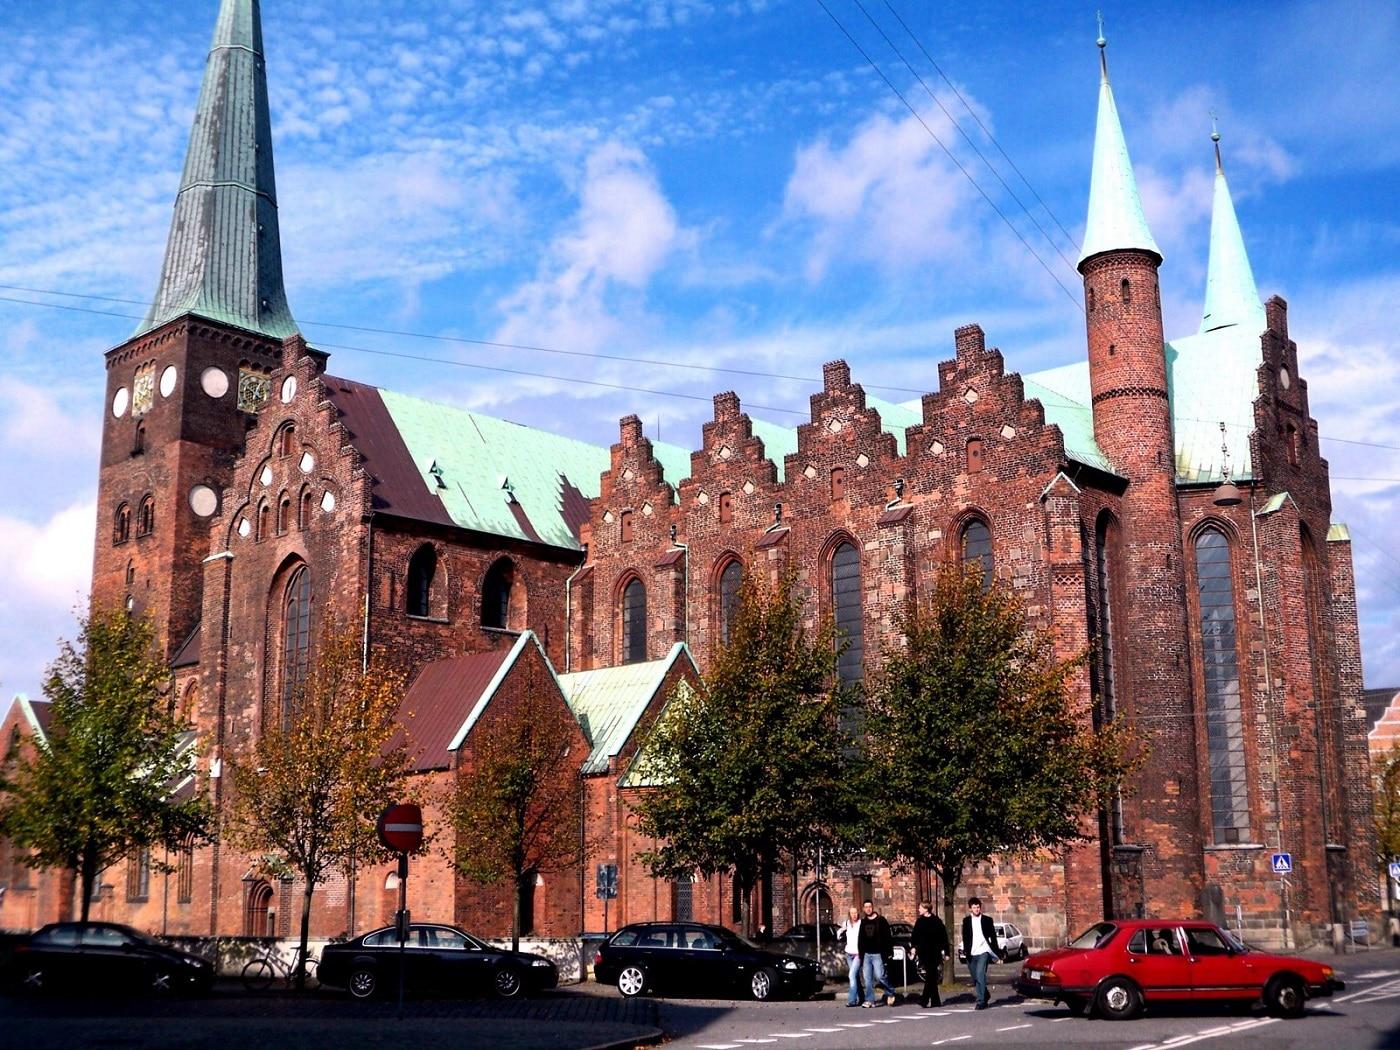 Catedrala din Arhus